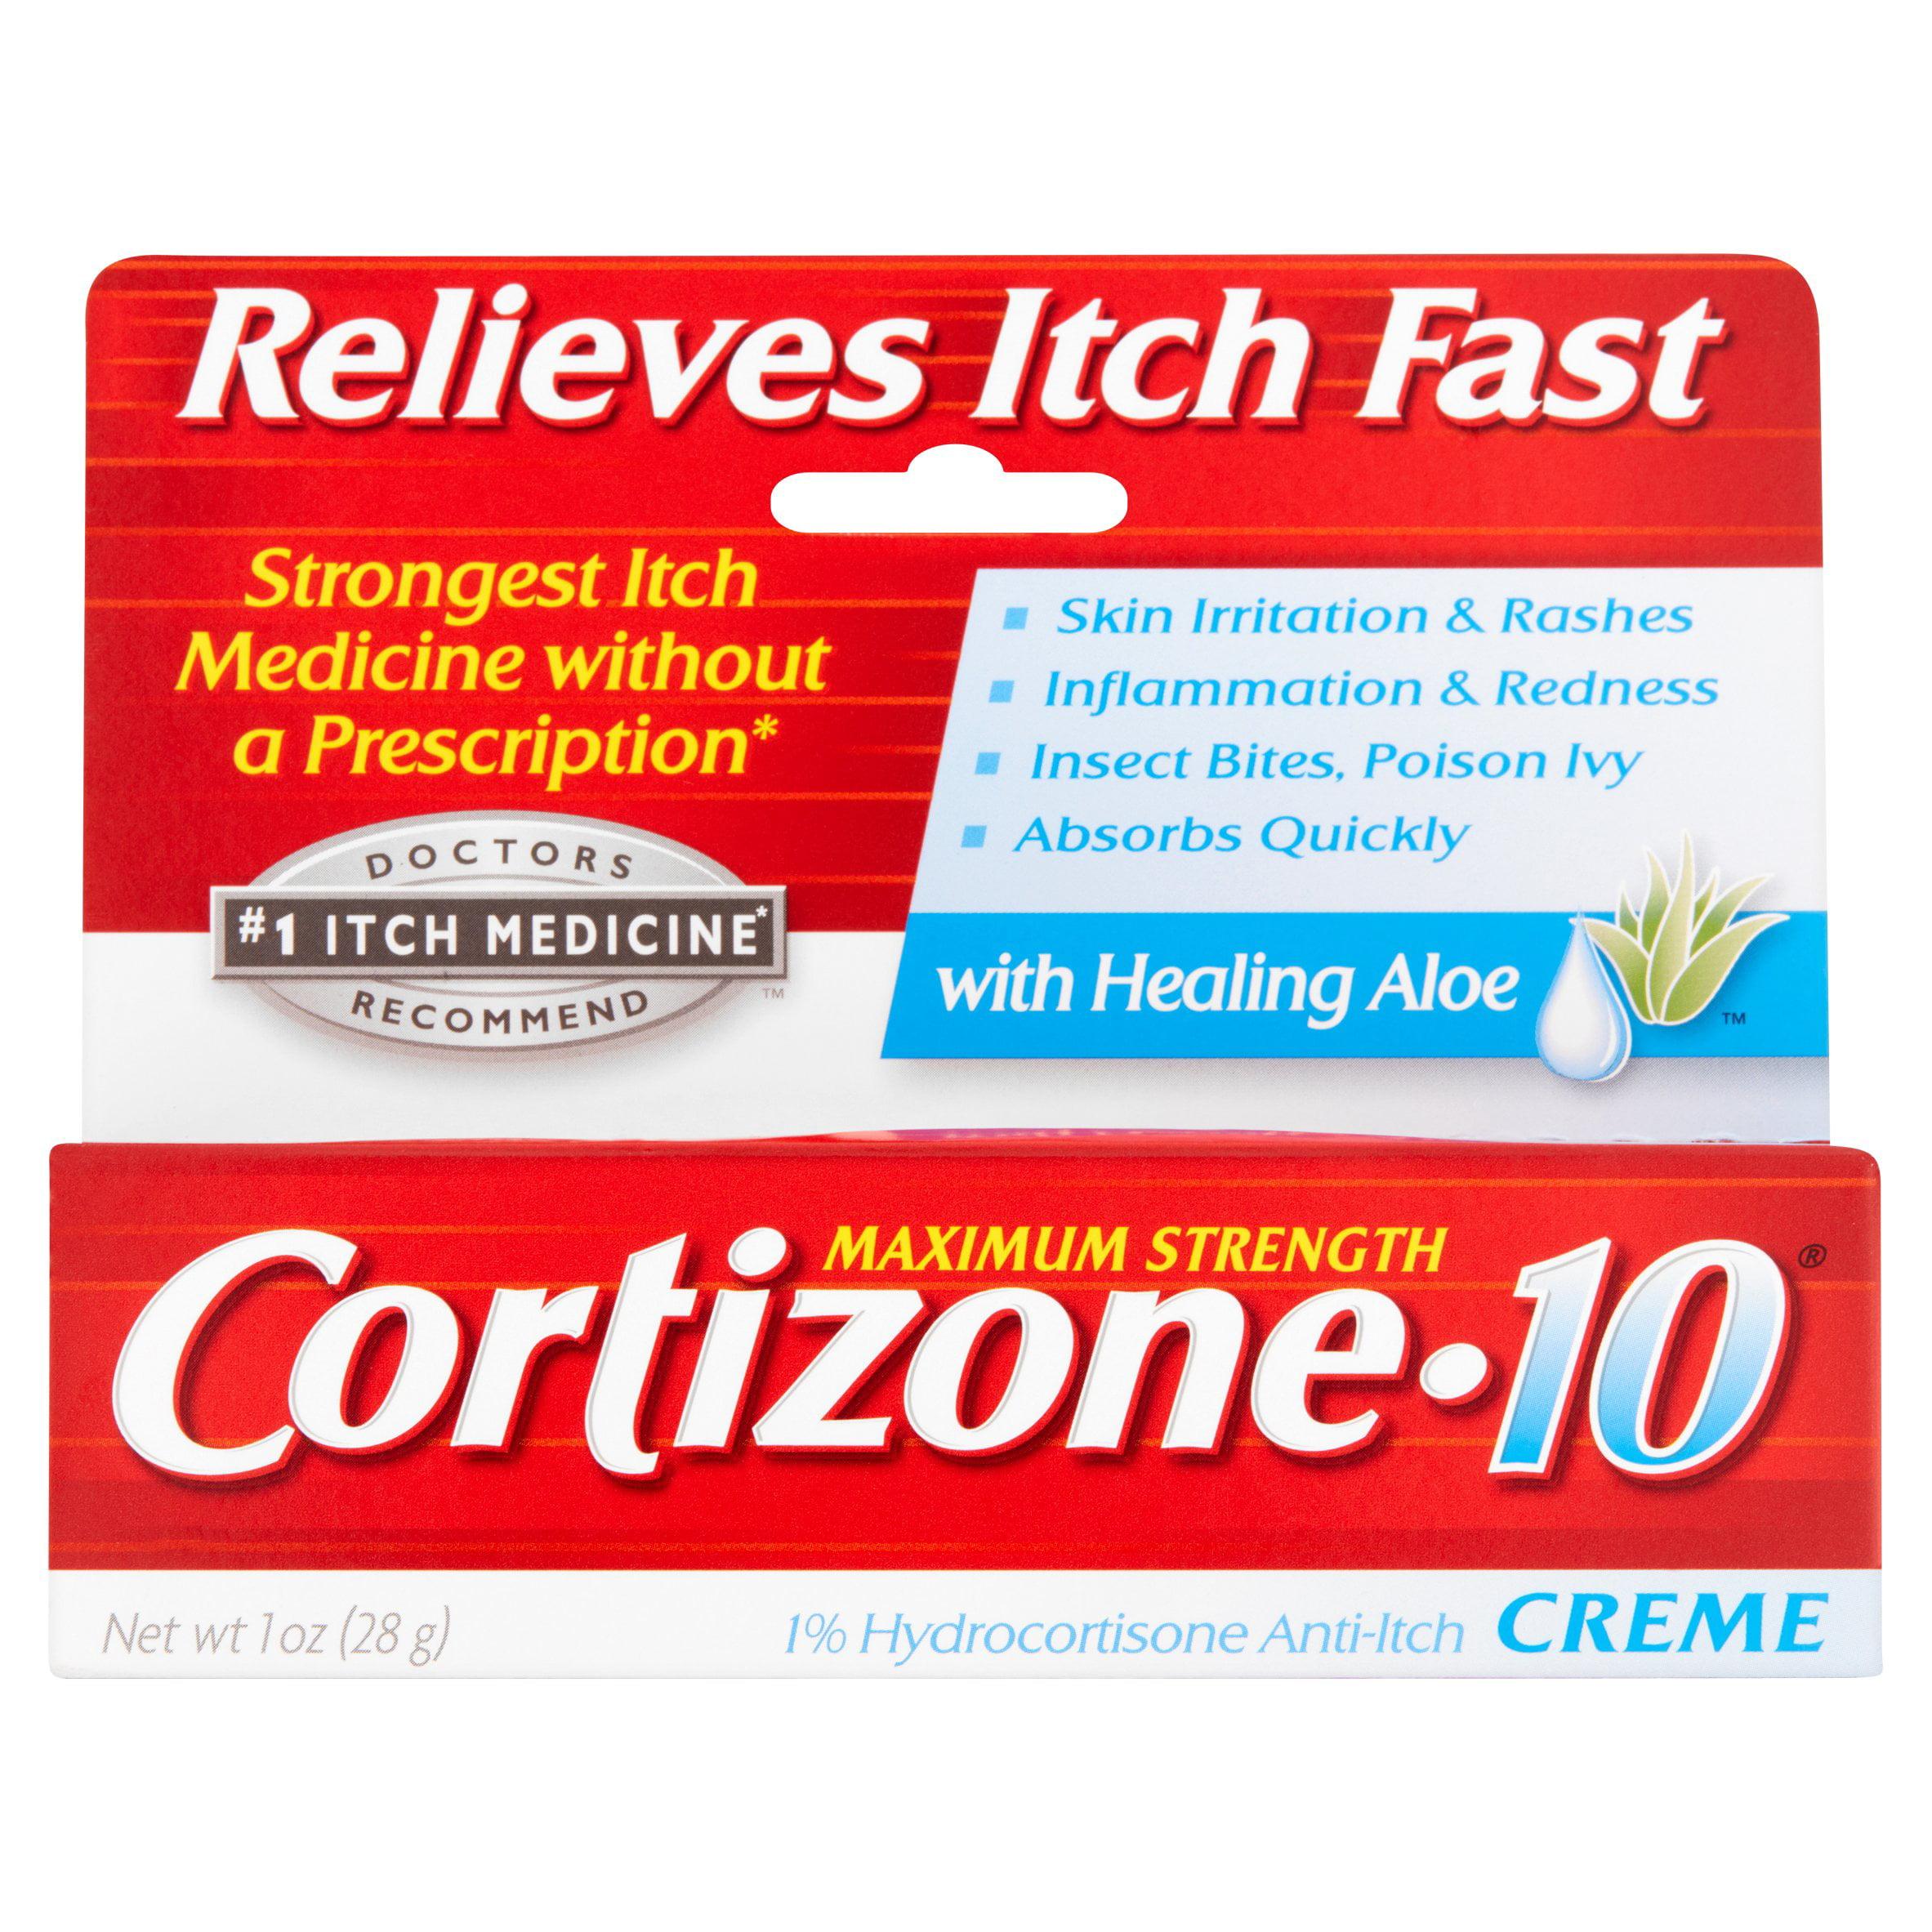 Cortizone 10 Maximum Strength 1% Hydrocortisone Anti-Itch Crème, 1oz